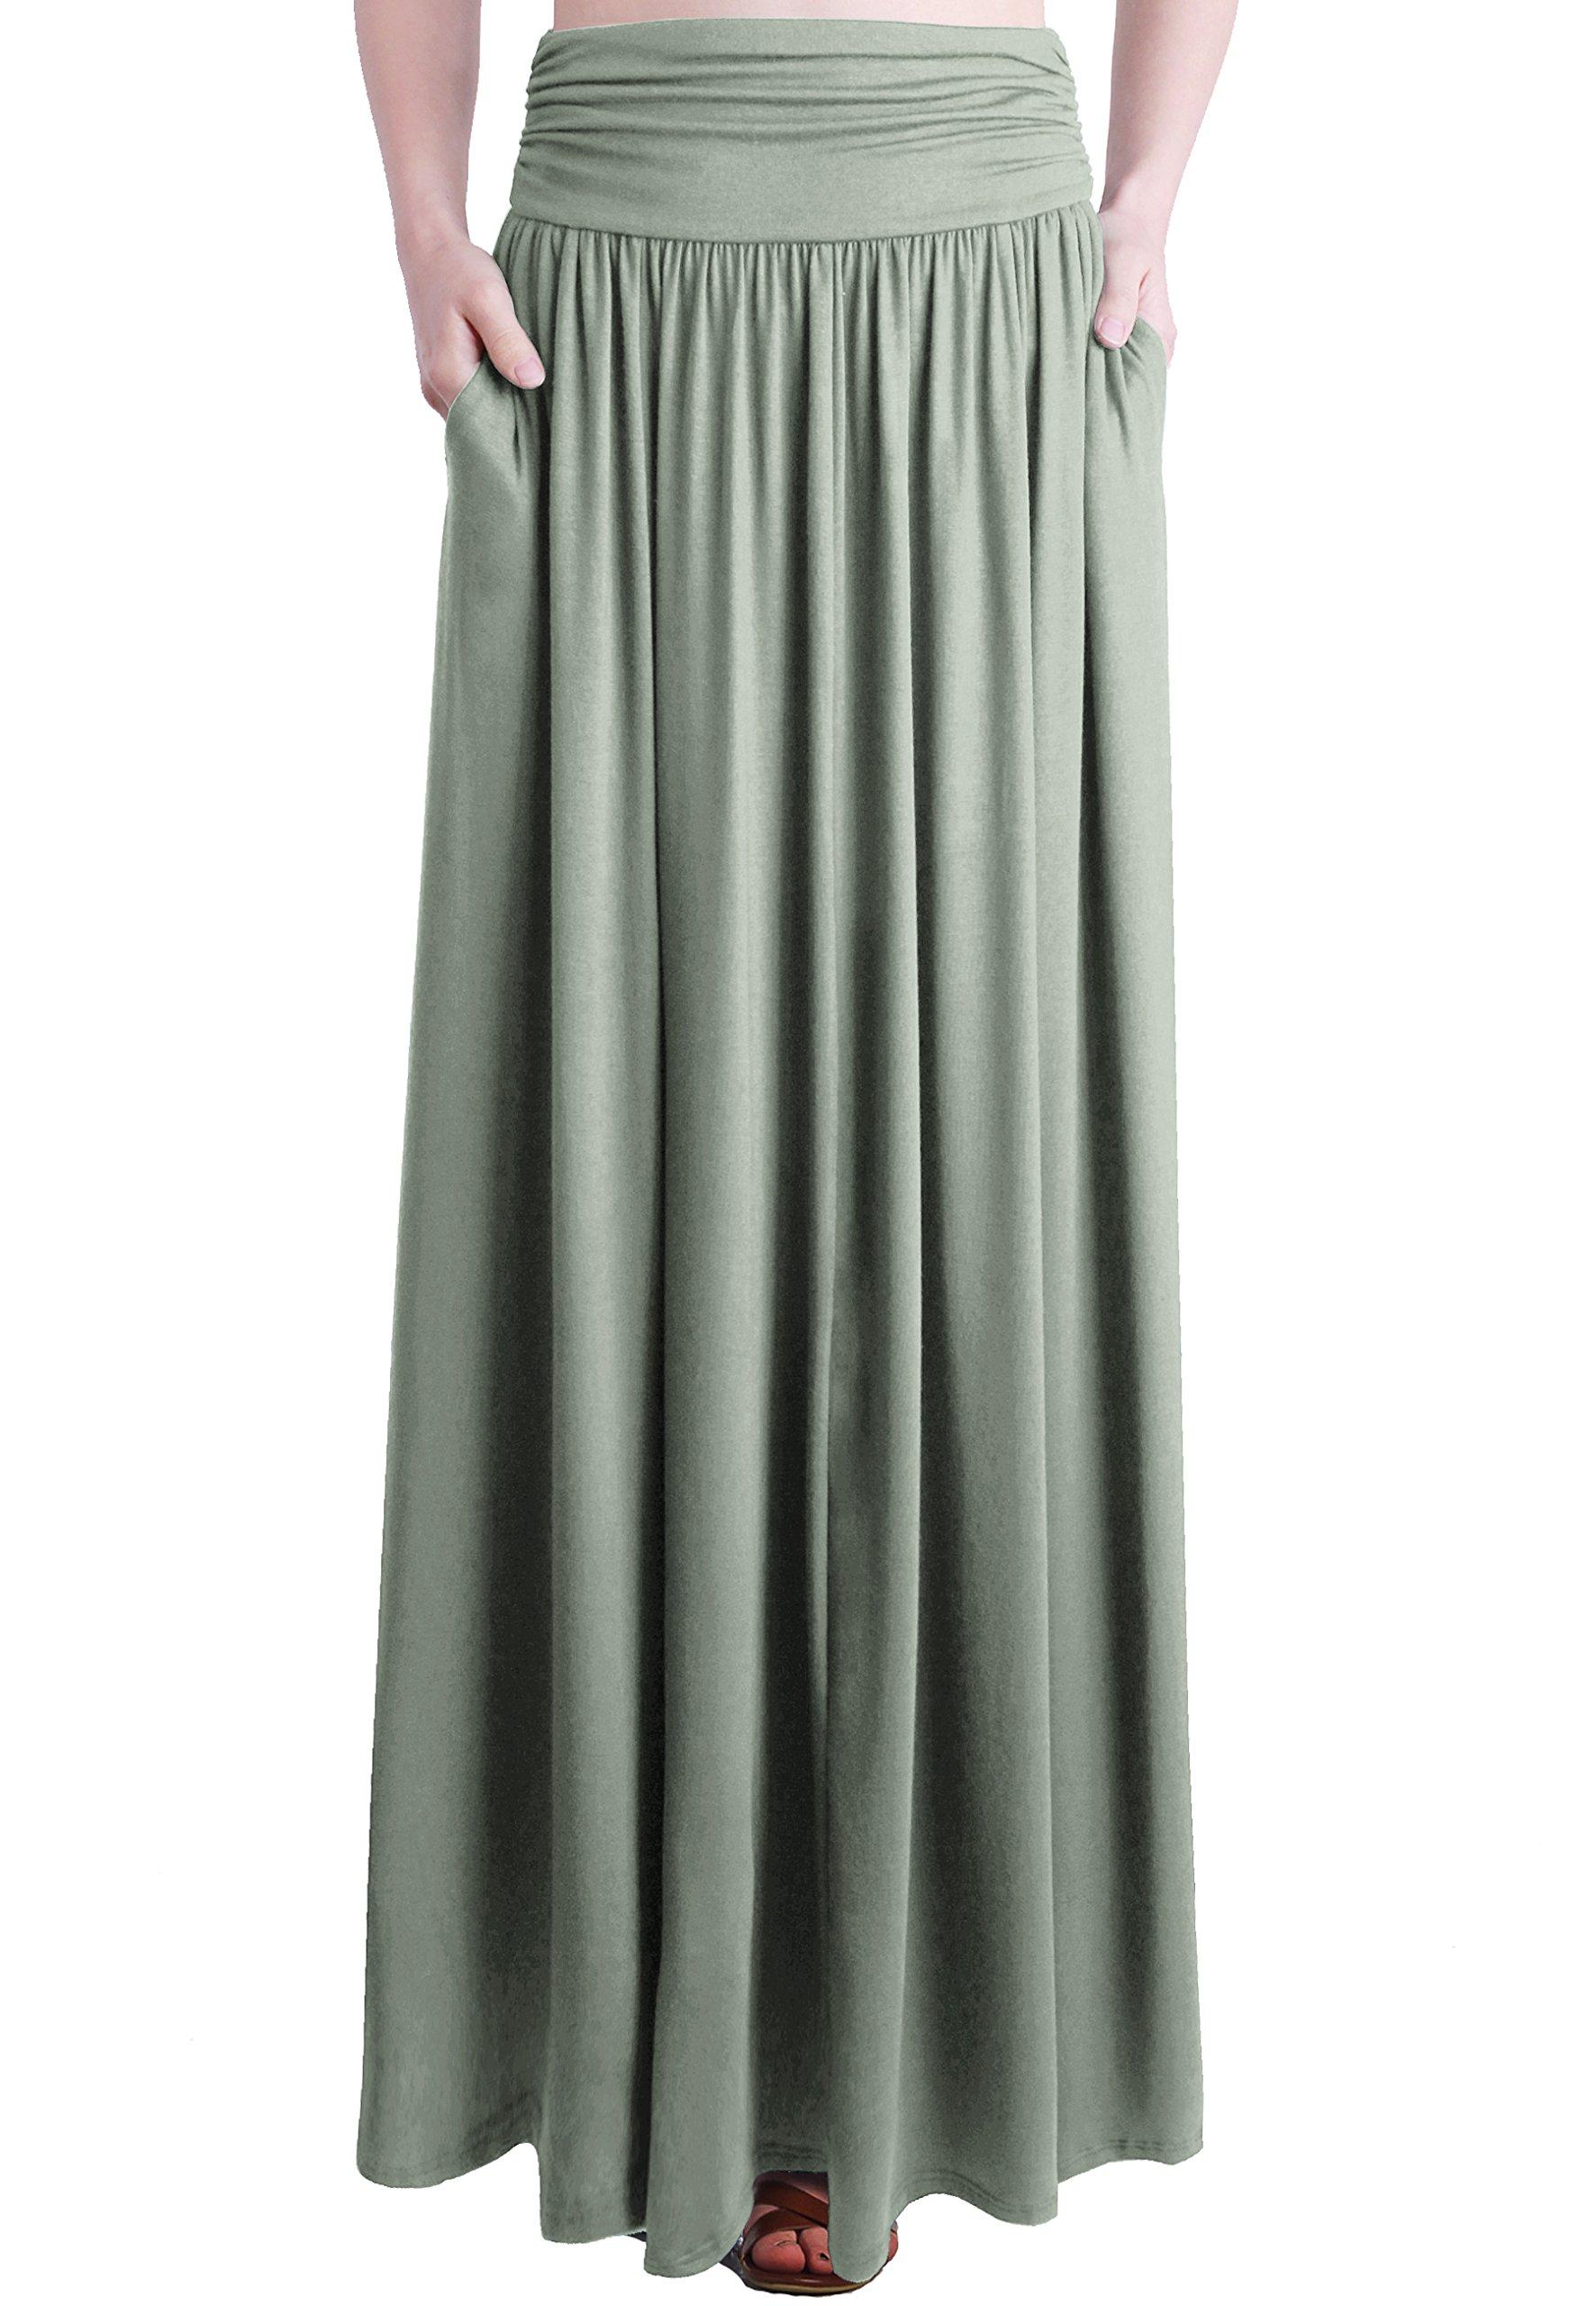 f8df6b65db Galleon - TRENDY UNITED Women's Rayon Spandex High Waist Shirring Maxi Skirt  With Pockets (DGRN, Large)